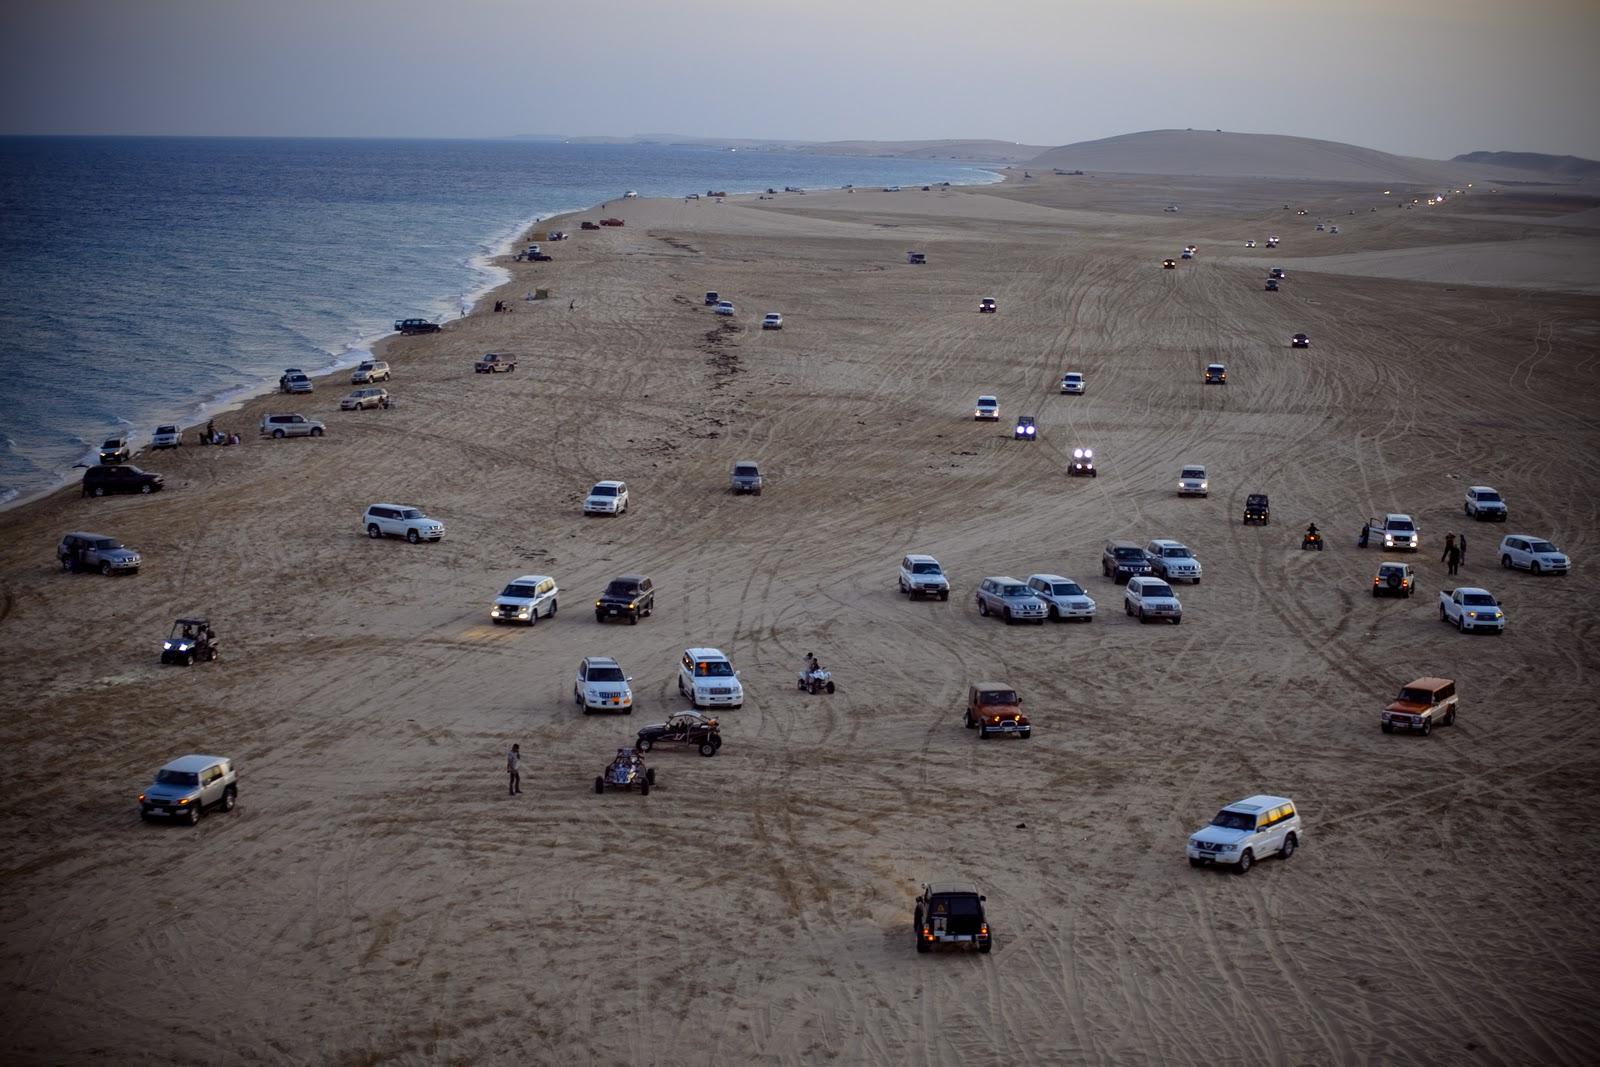 Mesaieed Qatar  city pictures gallery : Arjunpuri in Qatar: Mesaieed Beach in Qatar